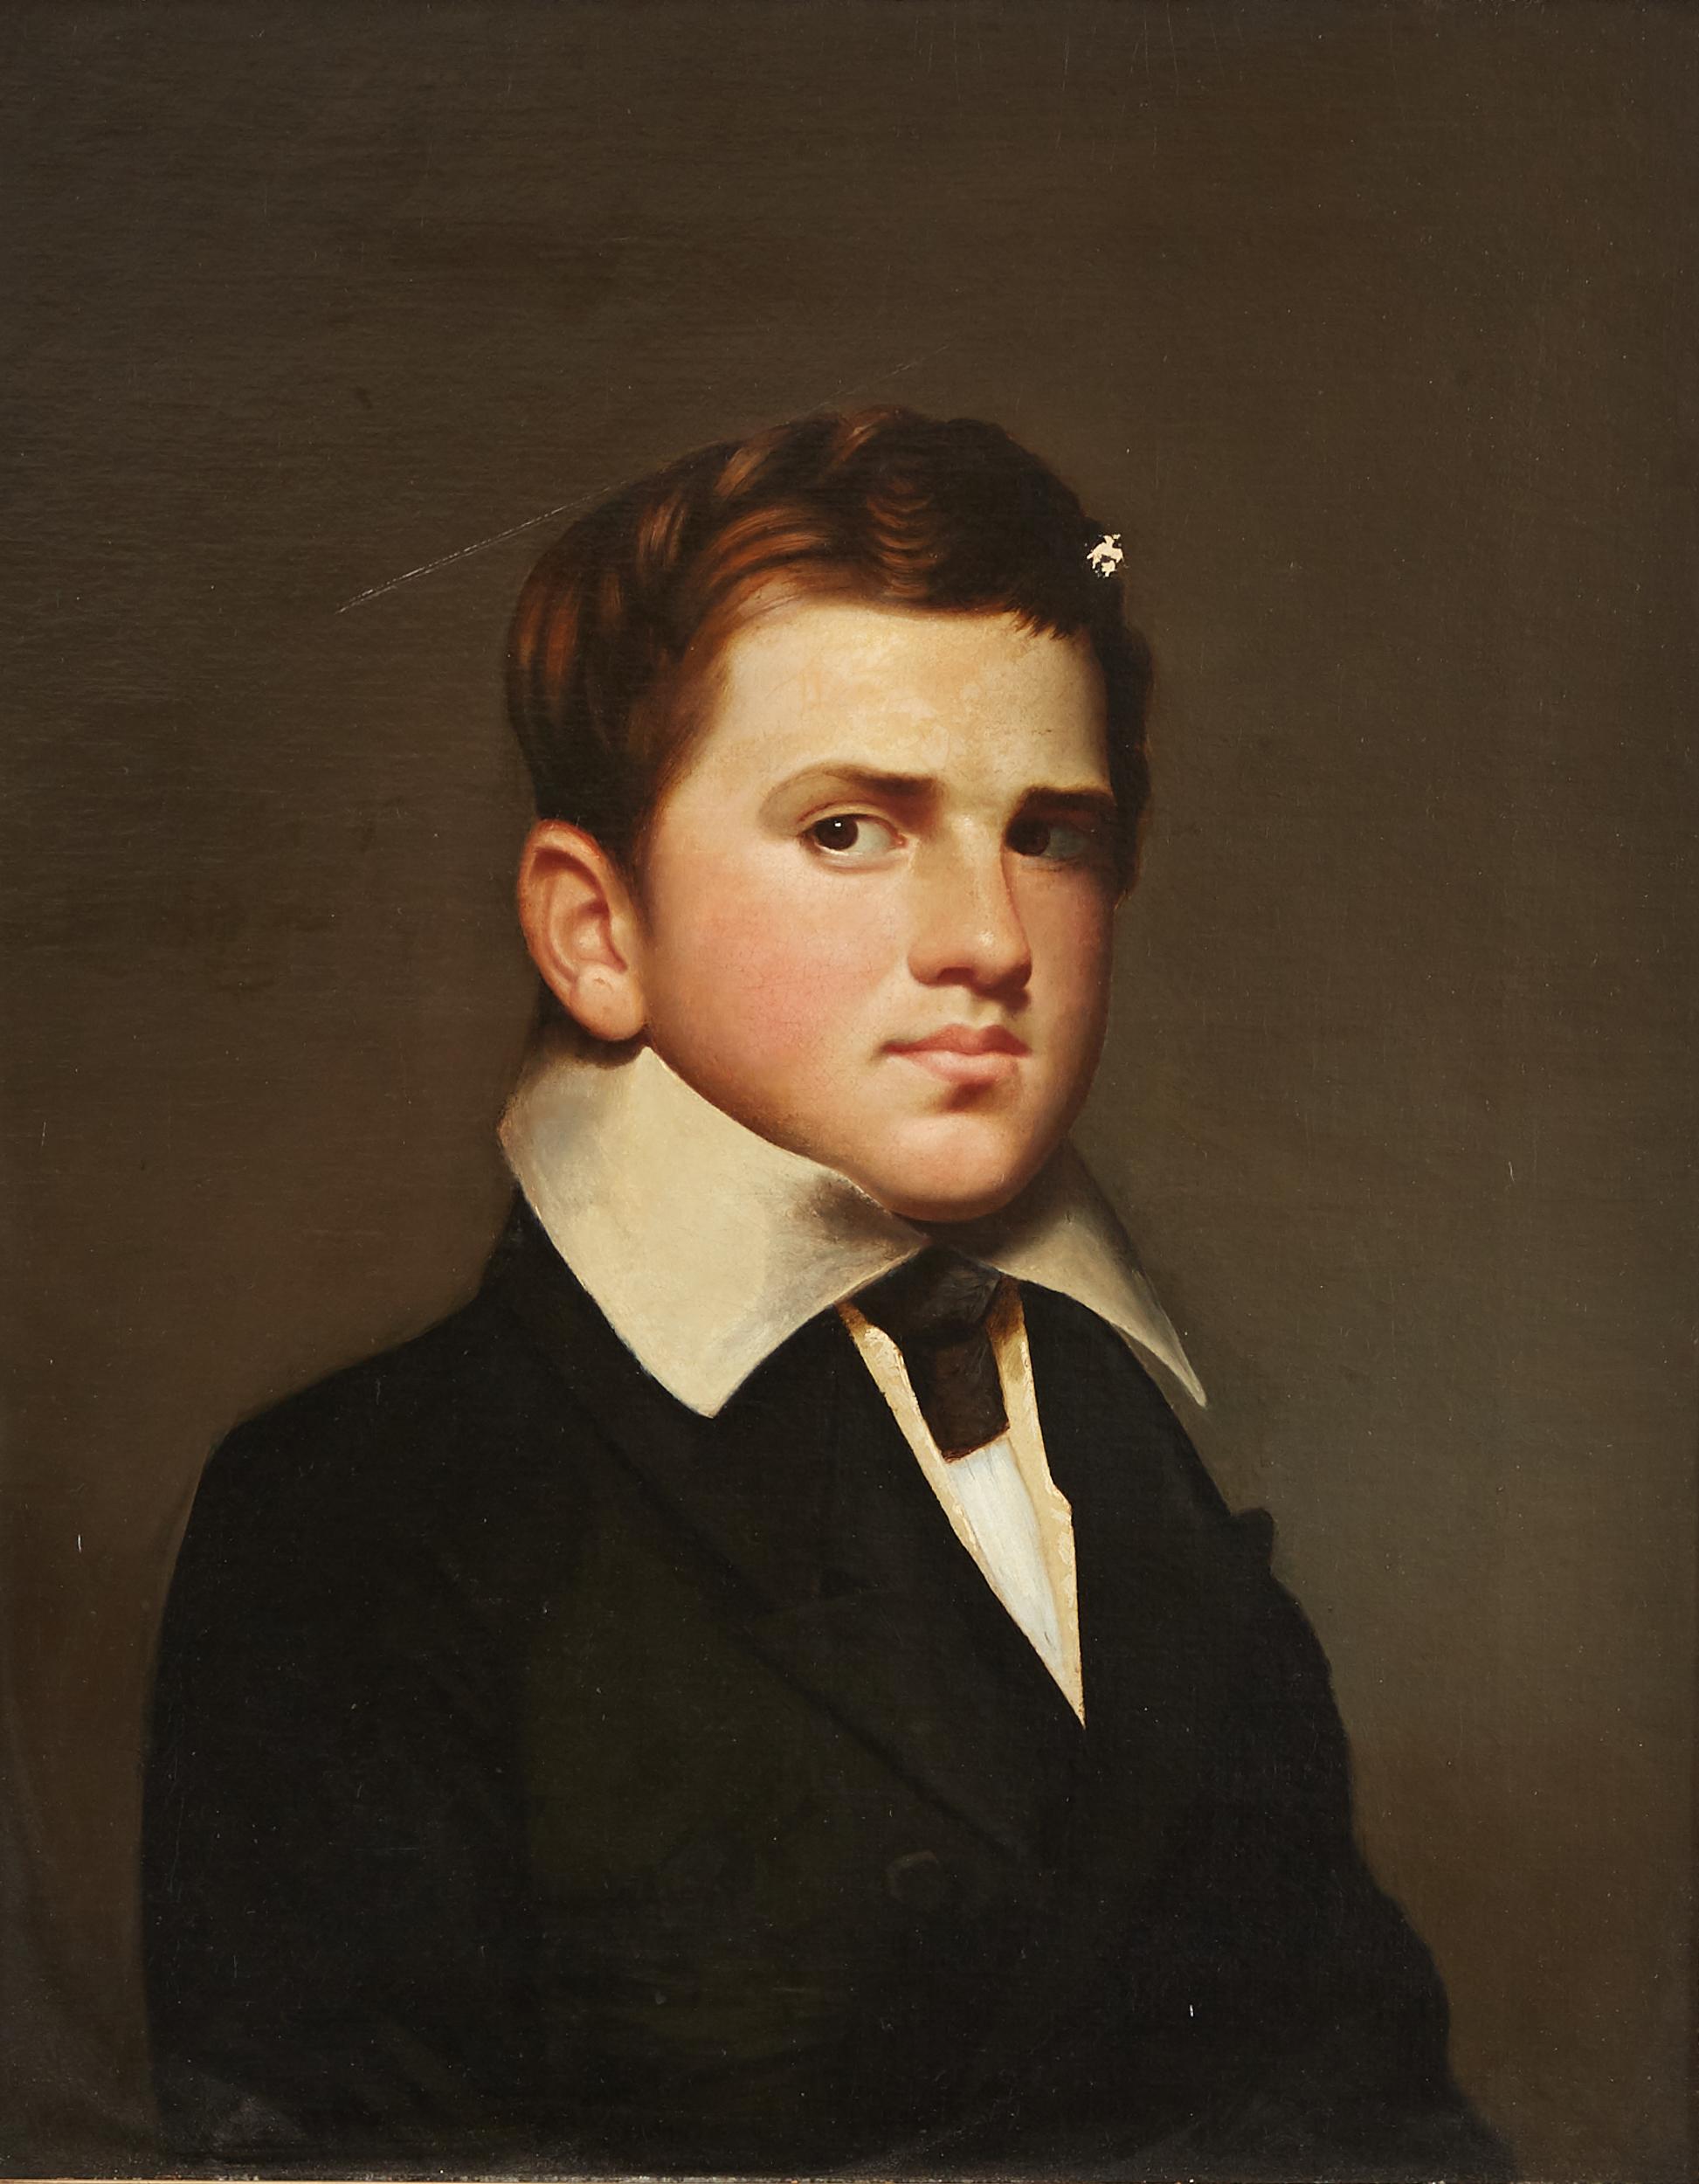 Lot 9 - Cephas Thompson Portrait of Charles Frederick Thompson